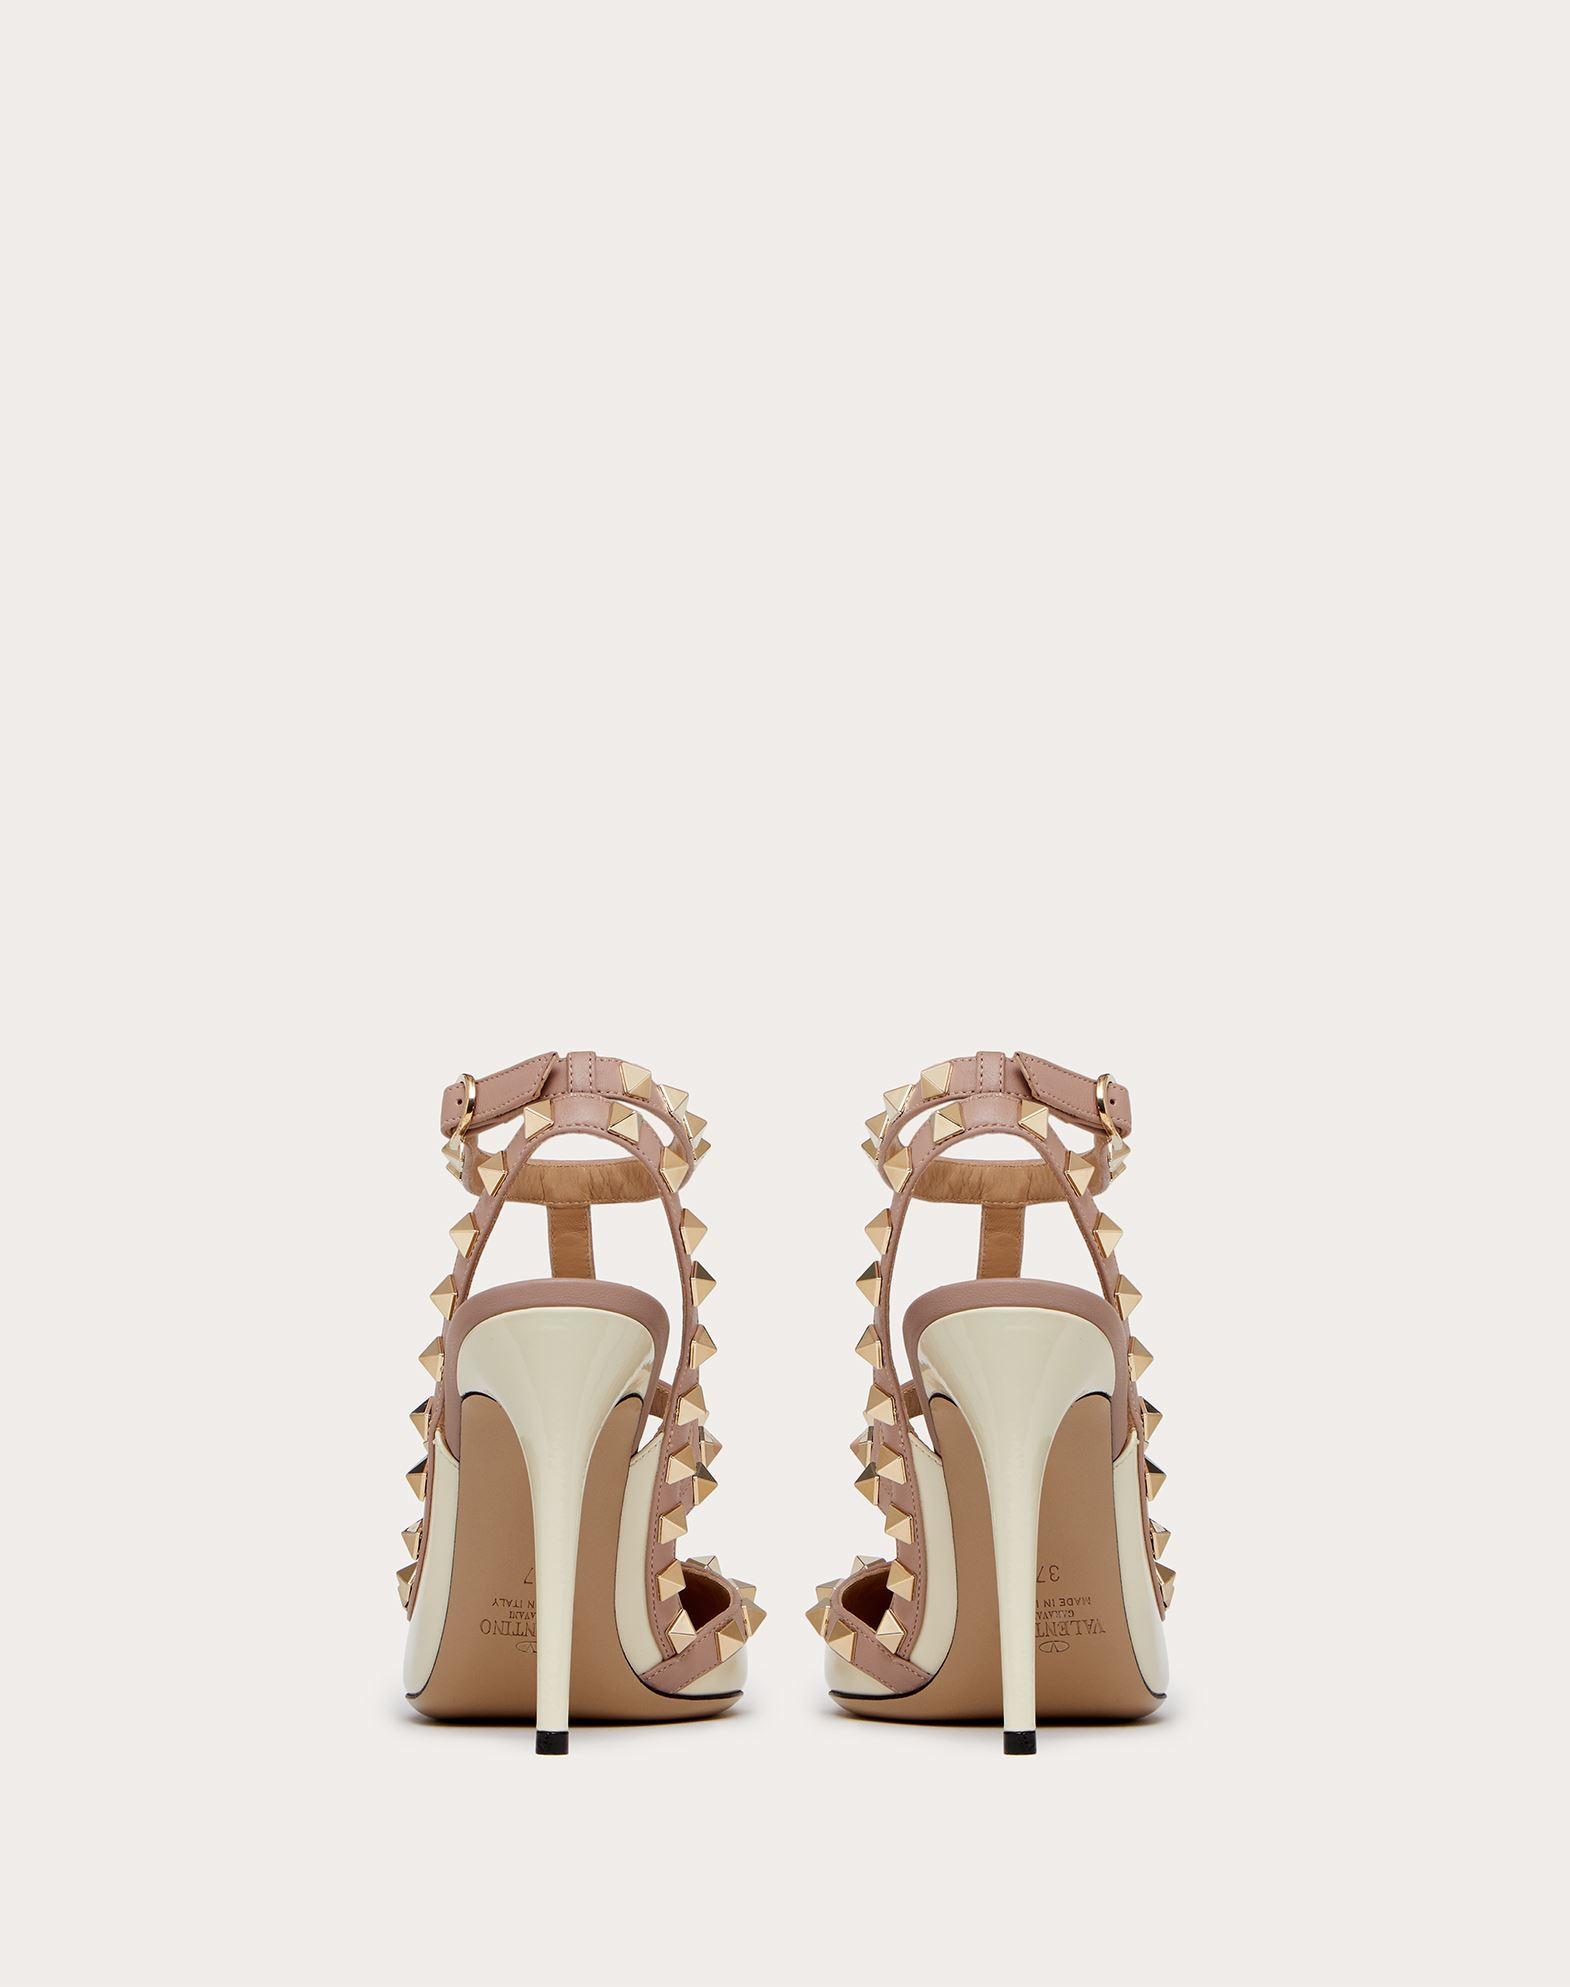 VALENTINO GARAVANI Rockstud Ankle Strap Pump HIGH HEEL PUMPS D d